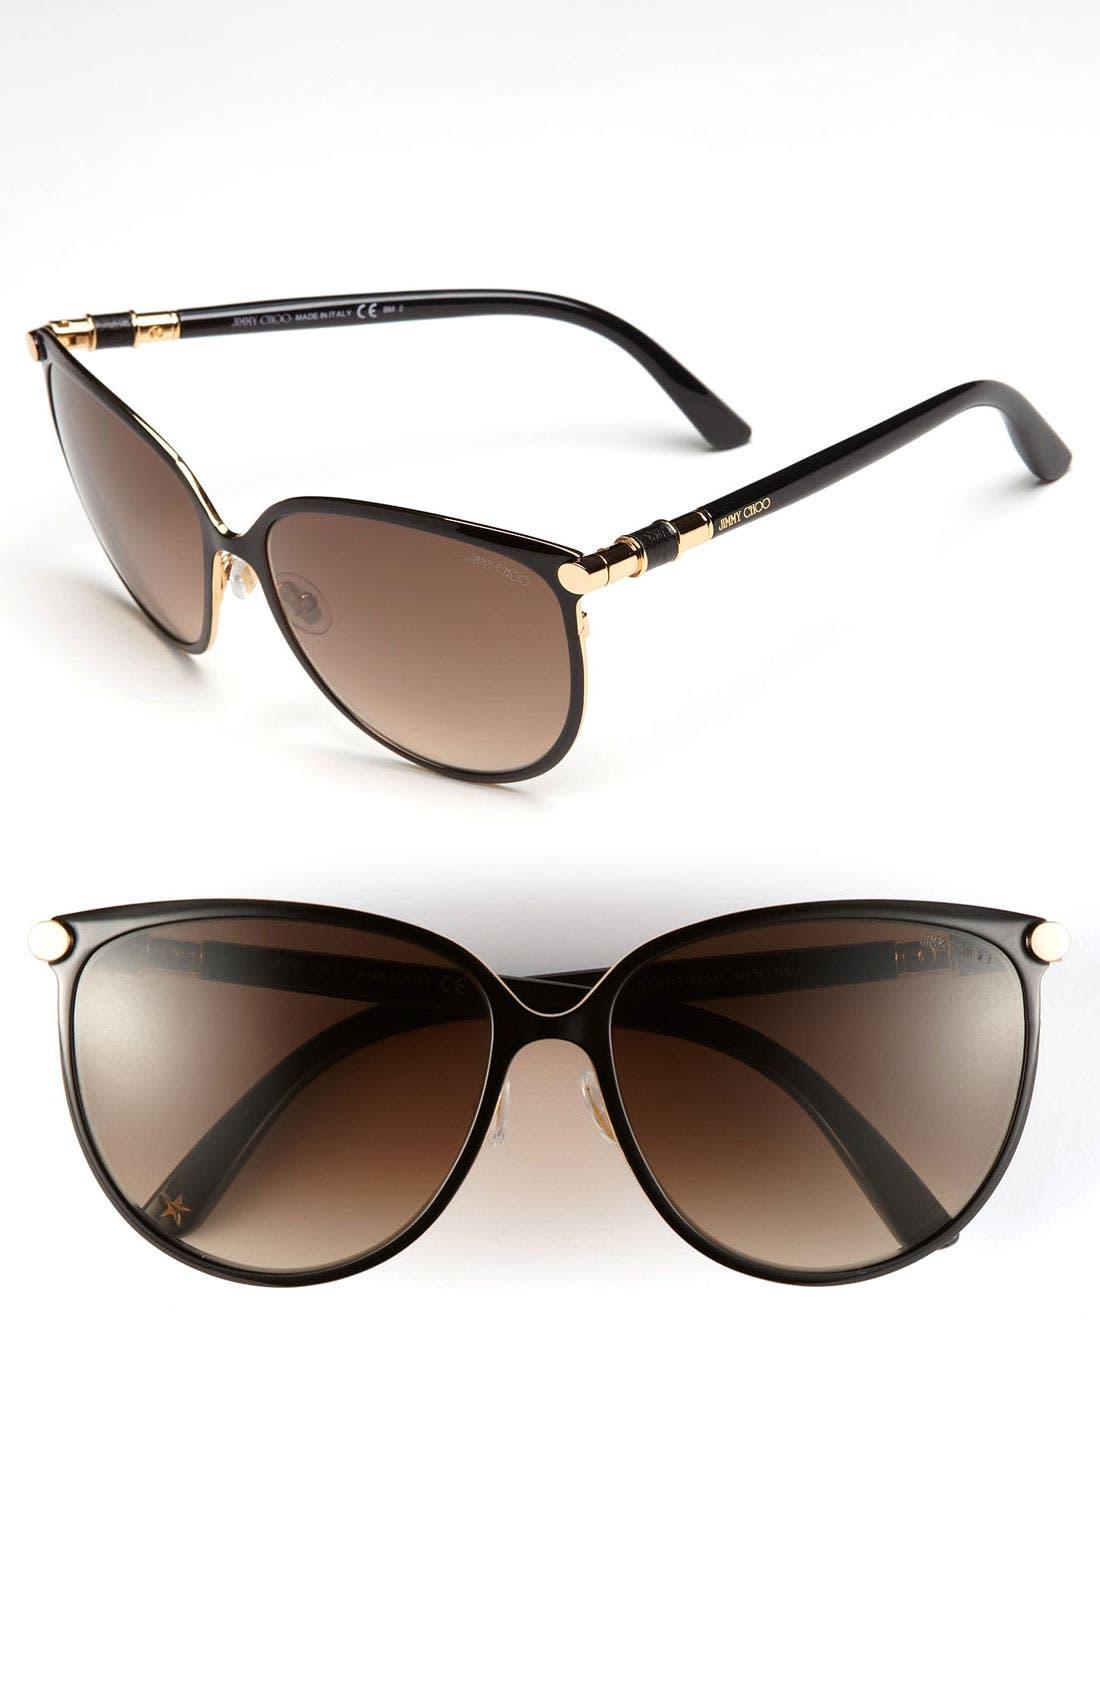 Alternate Image 1 Selected - Jimmy Choo 'Juliet' 60mm Cat's Eye Sunglasses